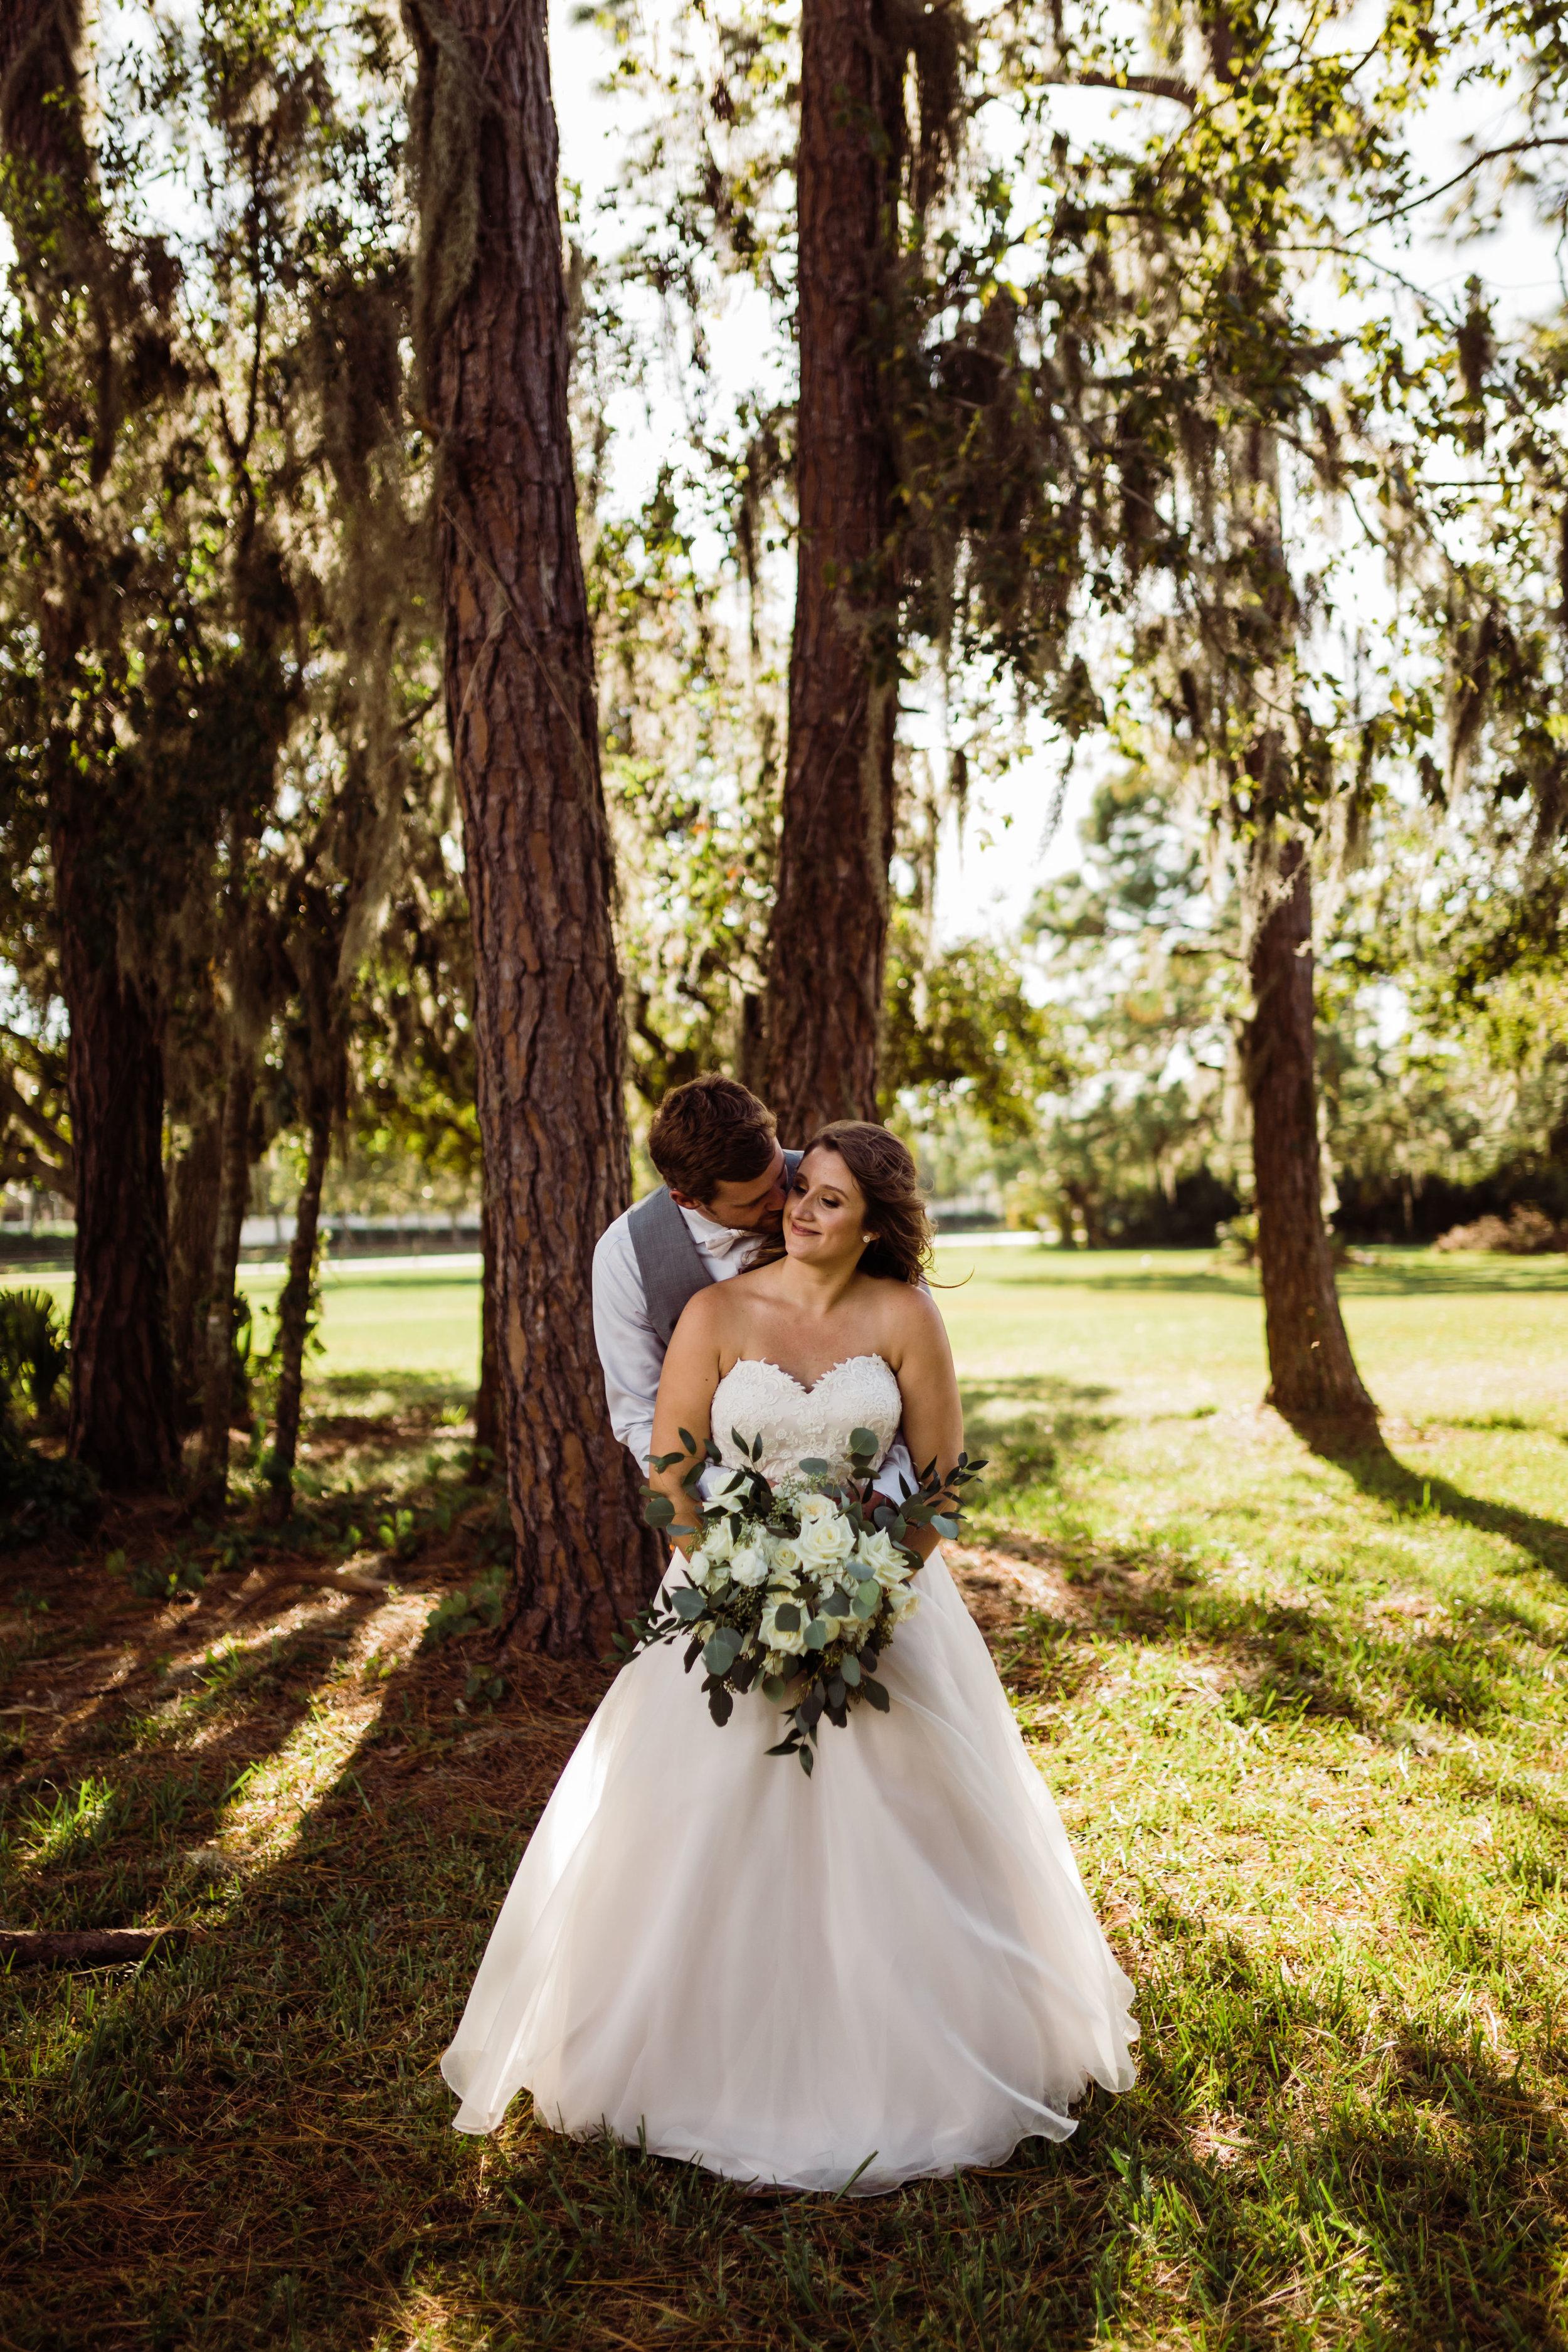 2017.10.14 Samantha and Matthew Crabtree Sarasota Wedding (333 of 708).jpg